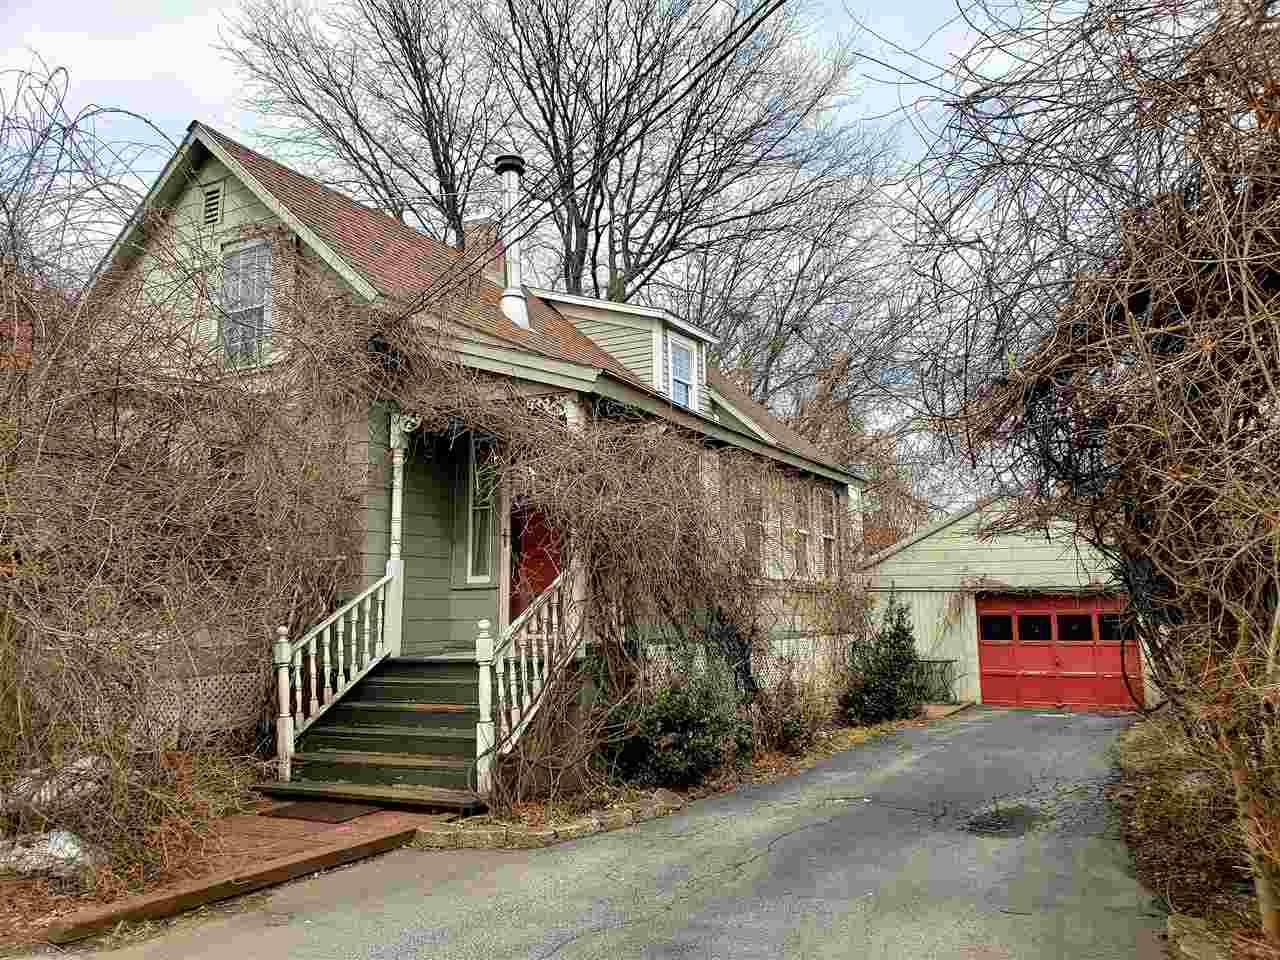 Photo of 4 Herbert Street Concord NH 03301